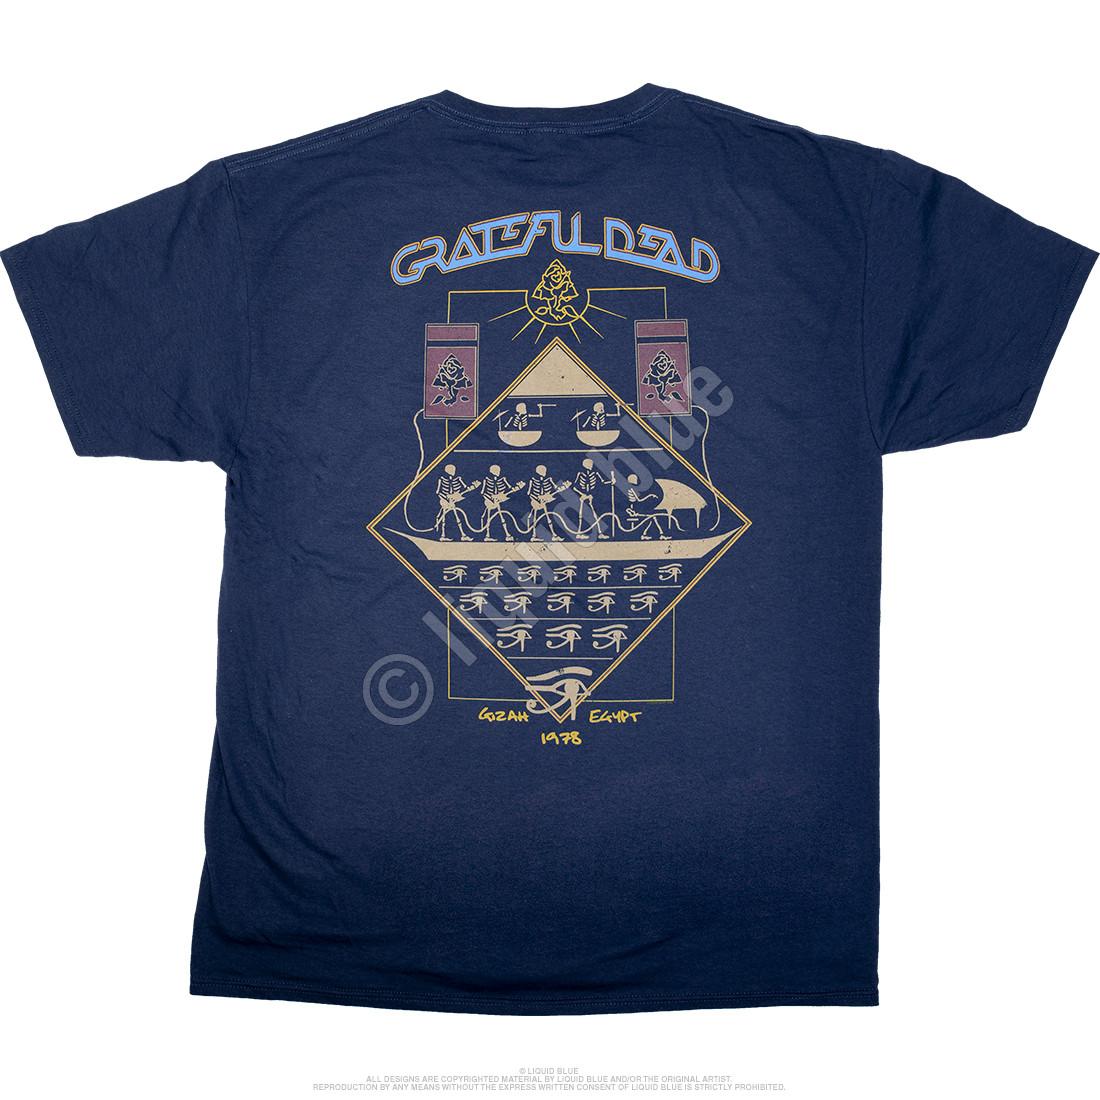 Egyptian Crew Navy T-Shirt